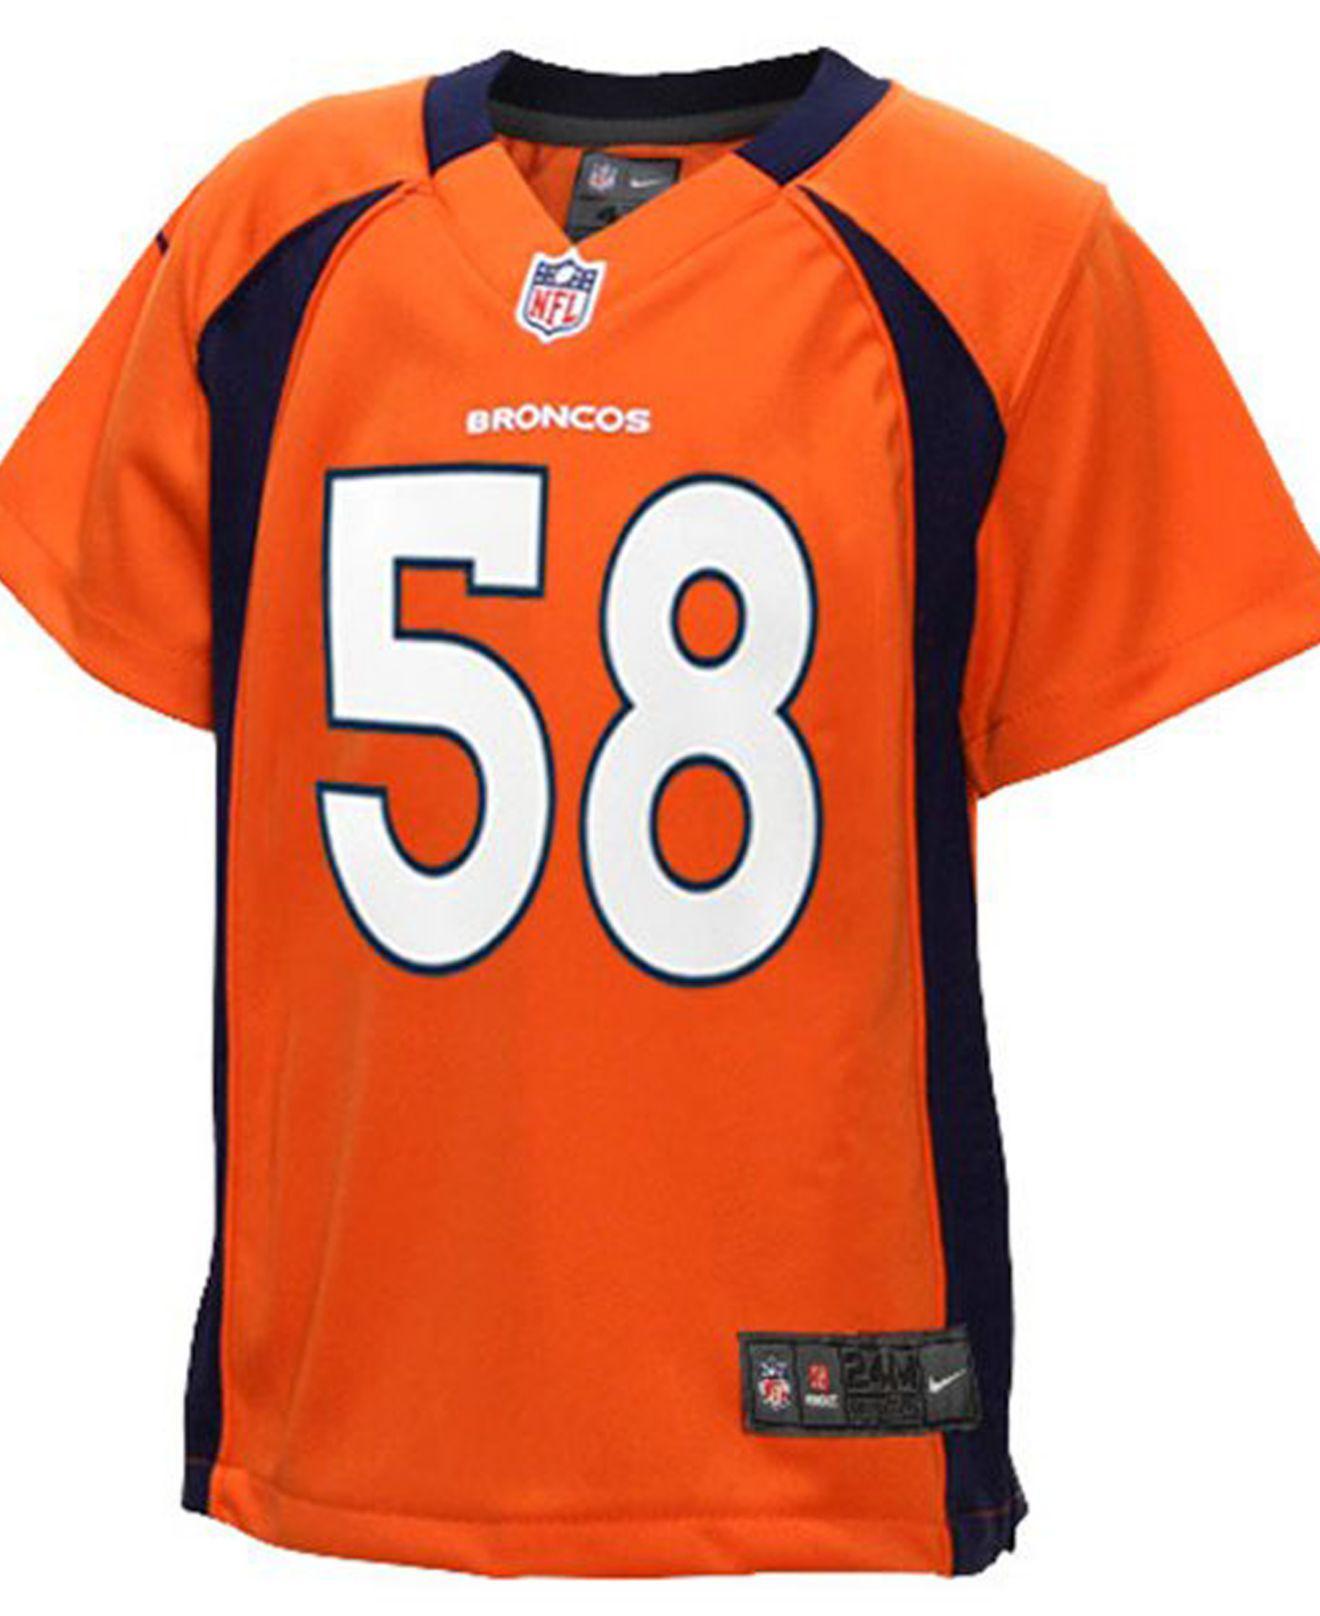 Lyst - Nike Toddlers  Von Miller Denver Broncos Jersey in Orange for Men e4903c2c8